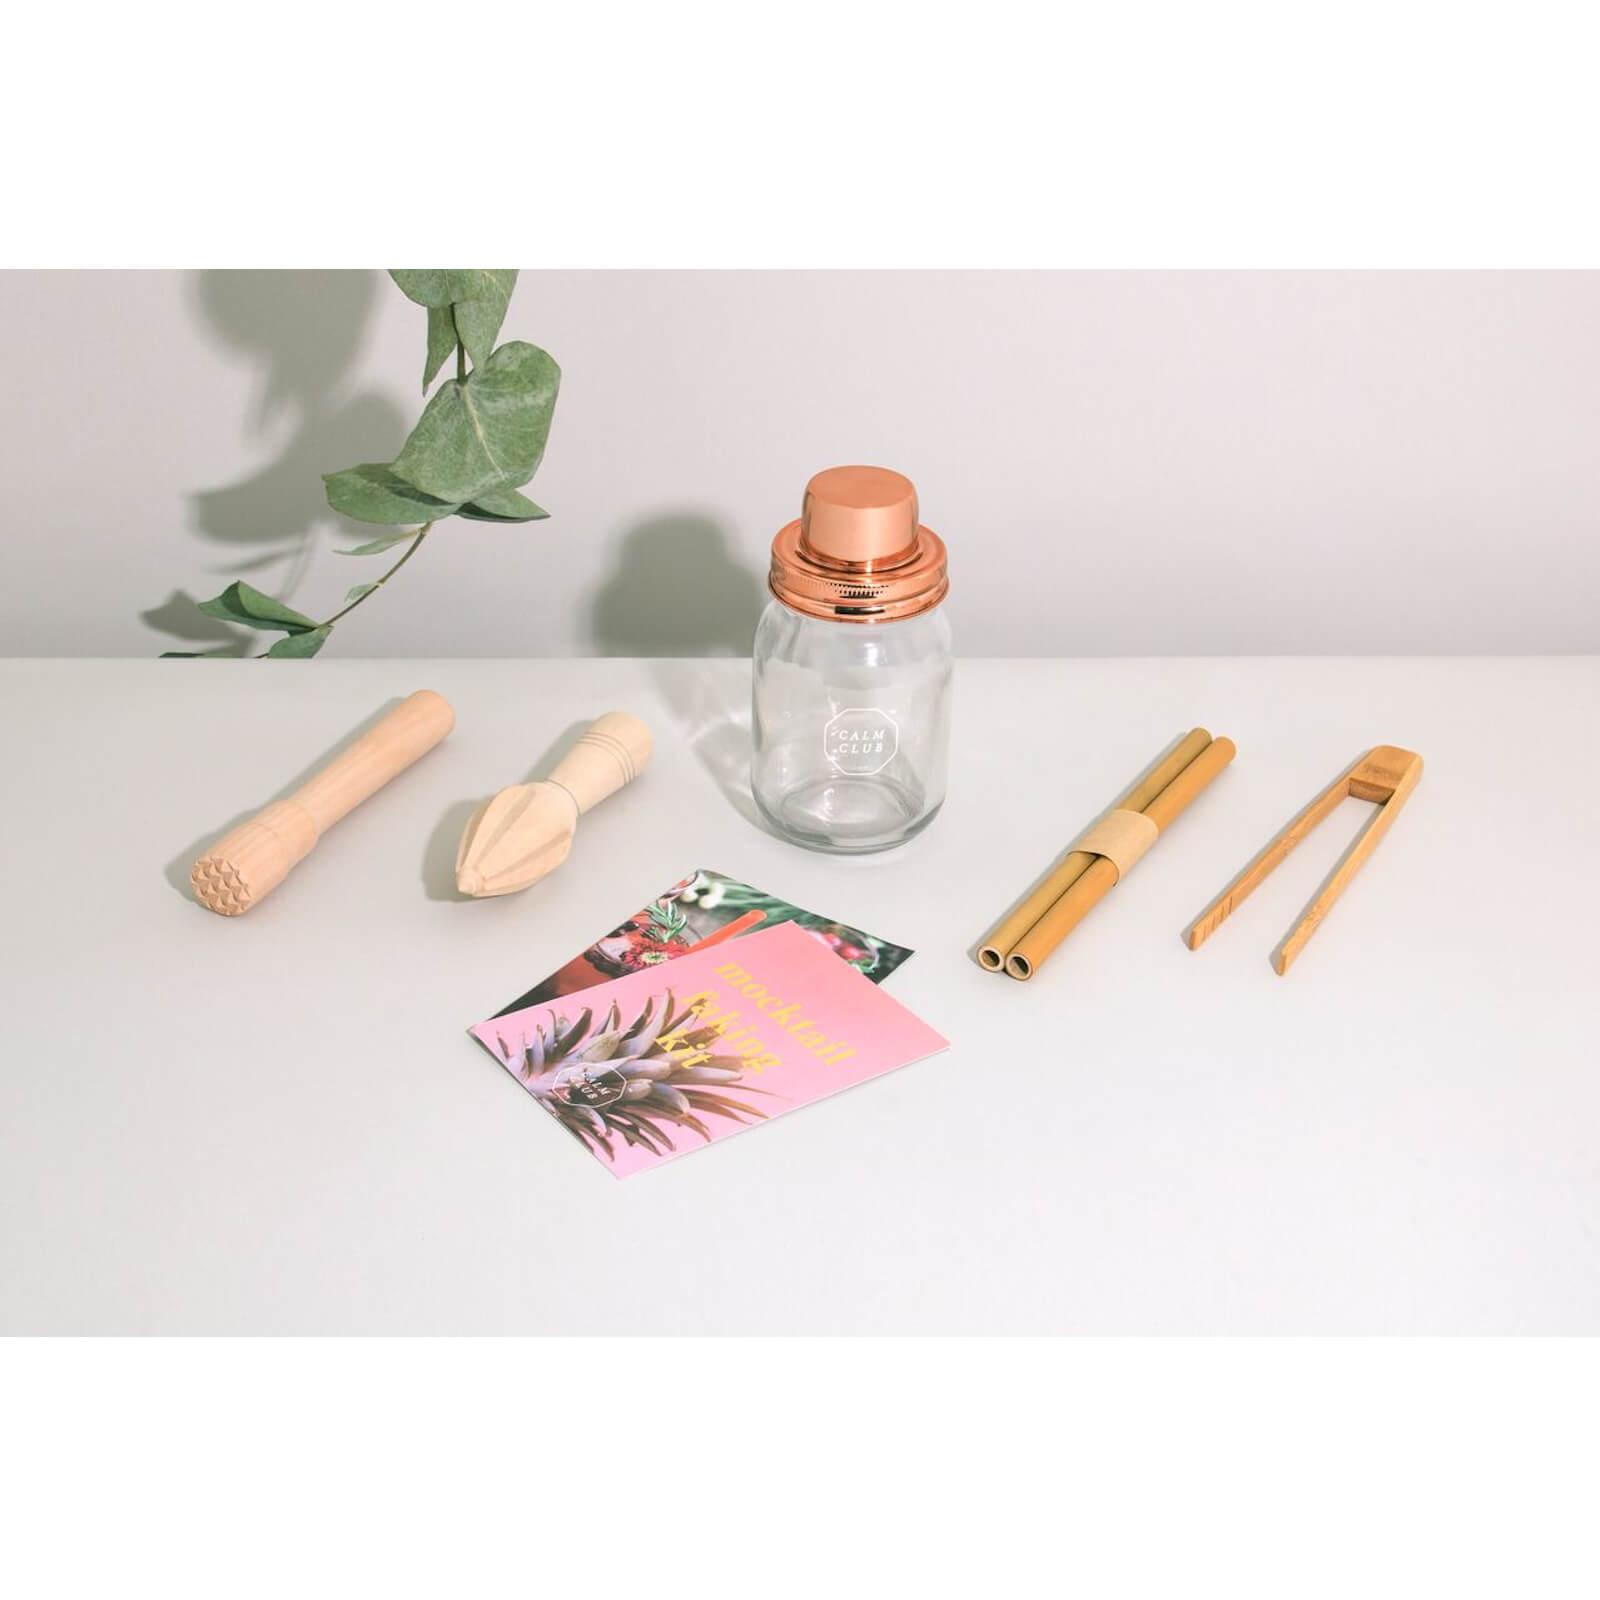 Image of Calm Club Mocktail Faking Kit